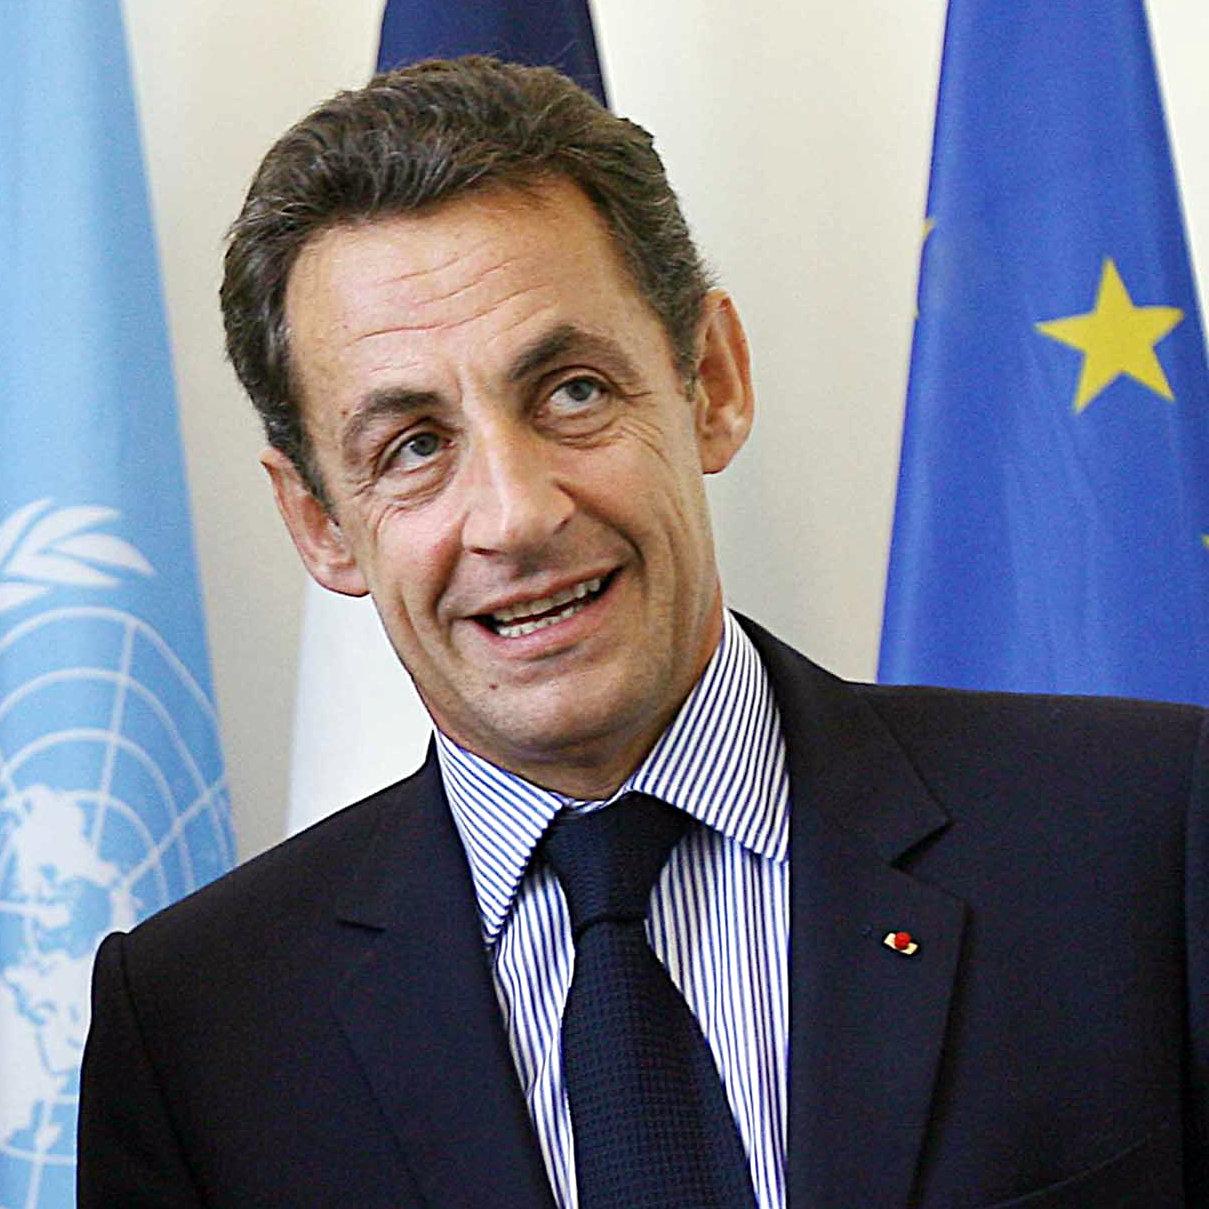 Sarkozy's Slight Return